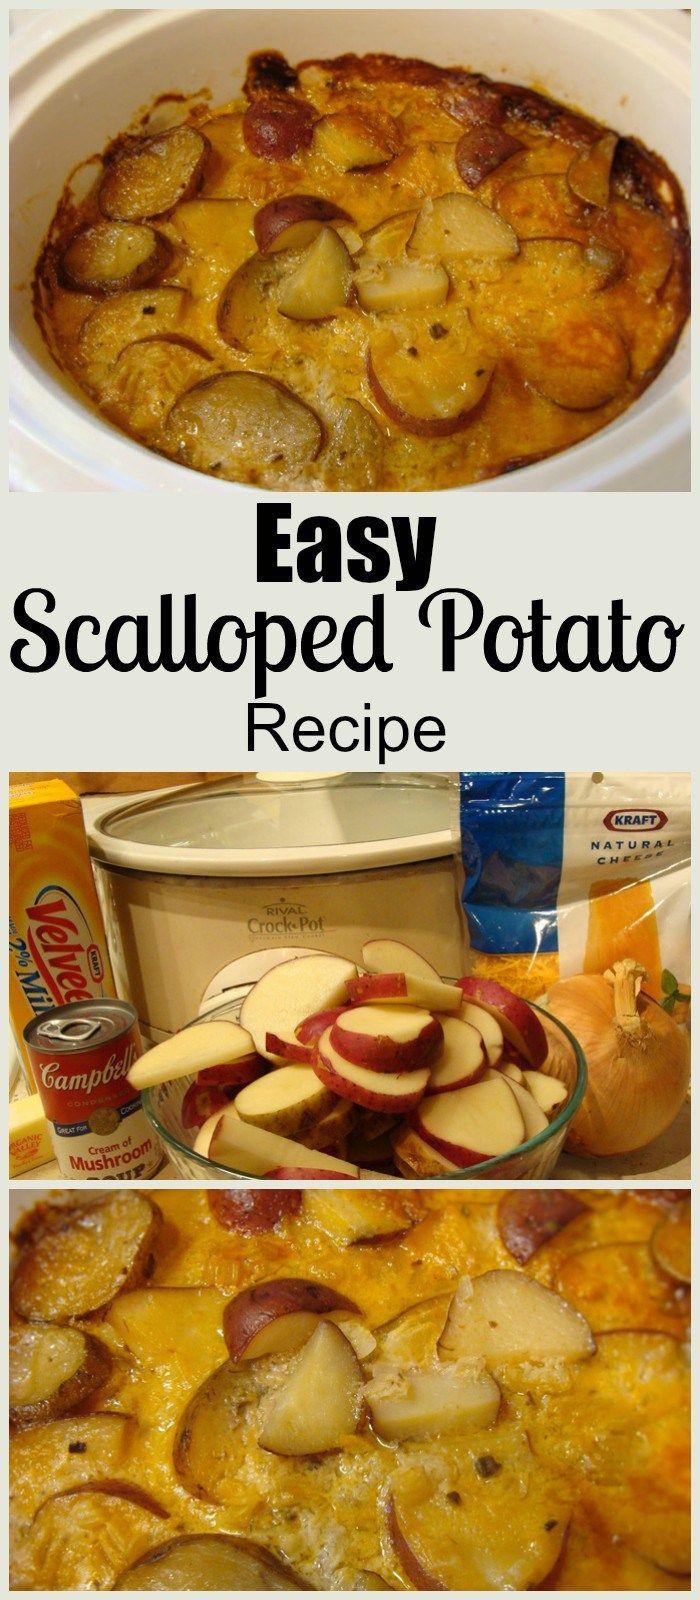 Healthy Slow Cooker Scalloped Potatoes  Easy Scalloped Potato Recipe